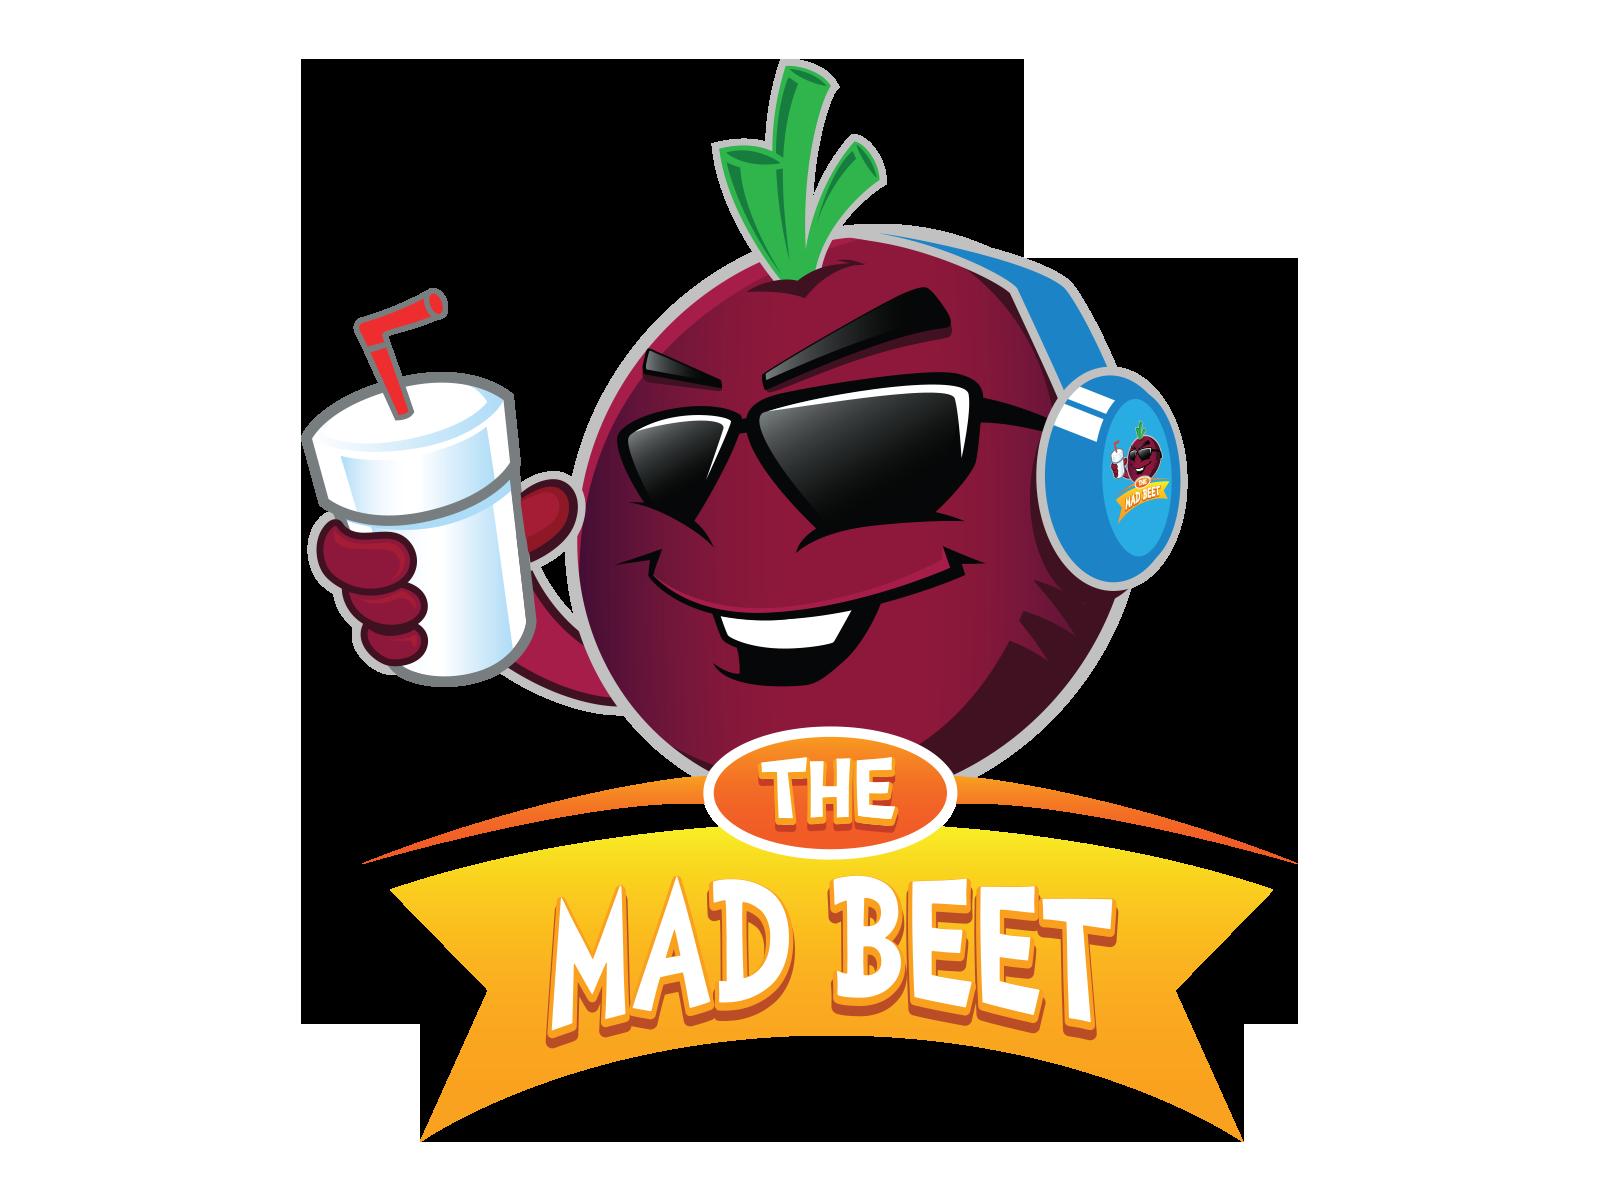 Mad Beet